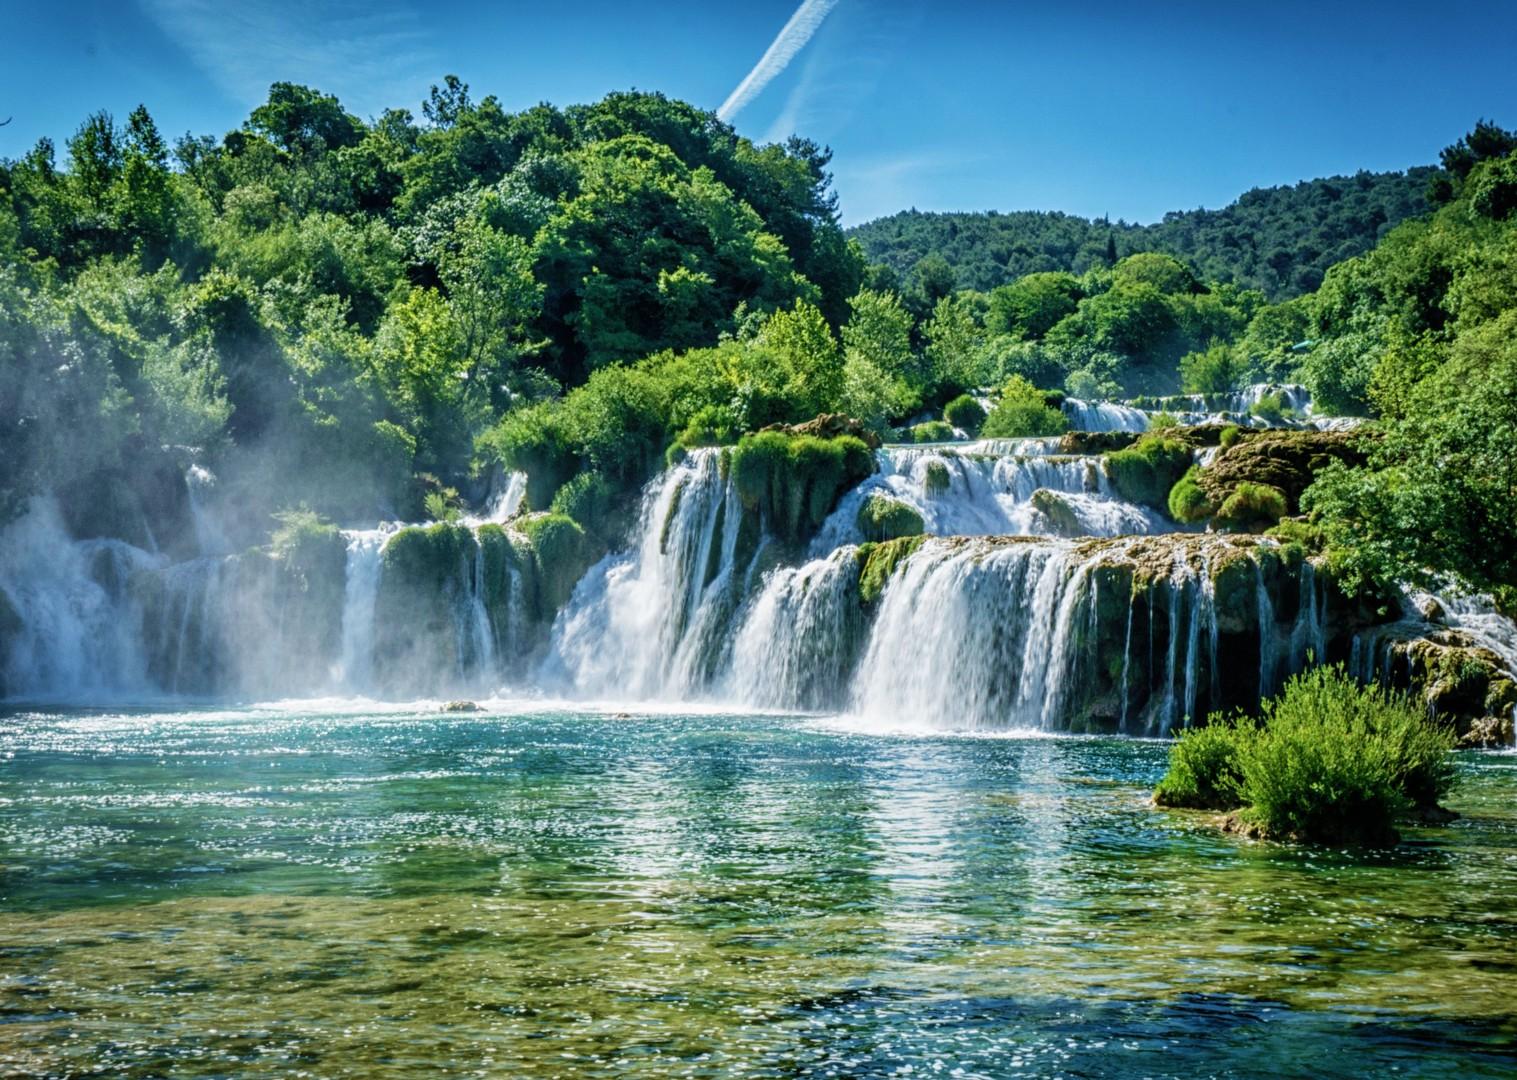 waterfalls-croatia-national-park-cycling-holiday.jpg - Croatia - Dalmatian National Parks and Islands - Bike and Boat Holiday - Leisure Cycling